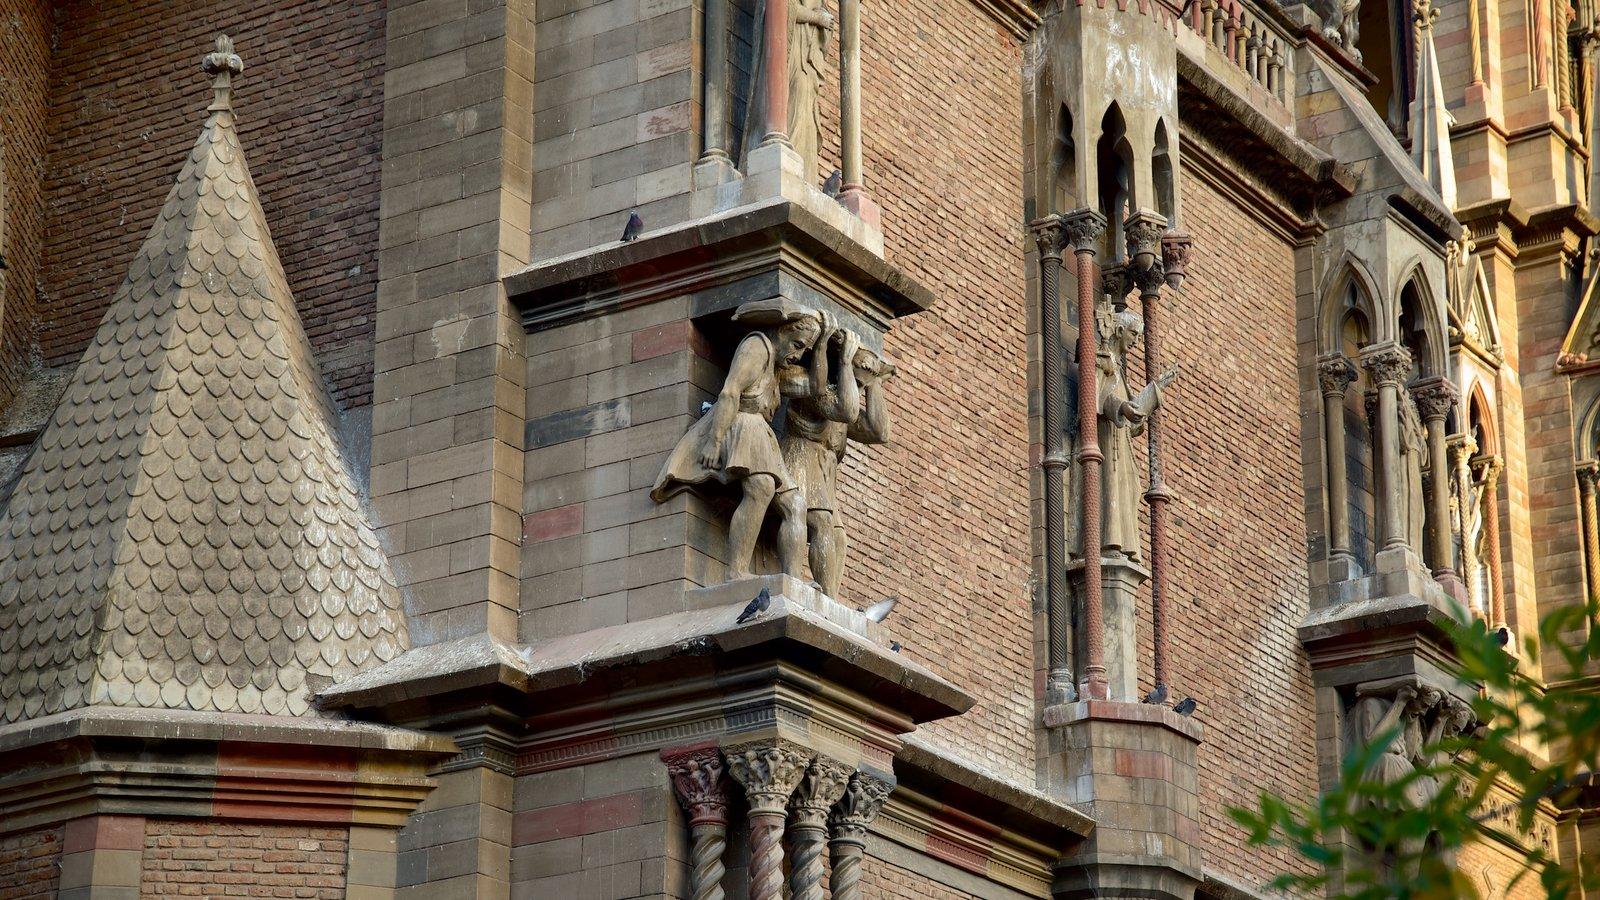 Iglesia del Sagrado Corazón caracterizando arquitetura de patrimônio, elementos religiosos e uma igreja ou catedral